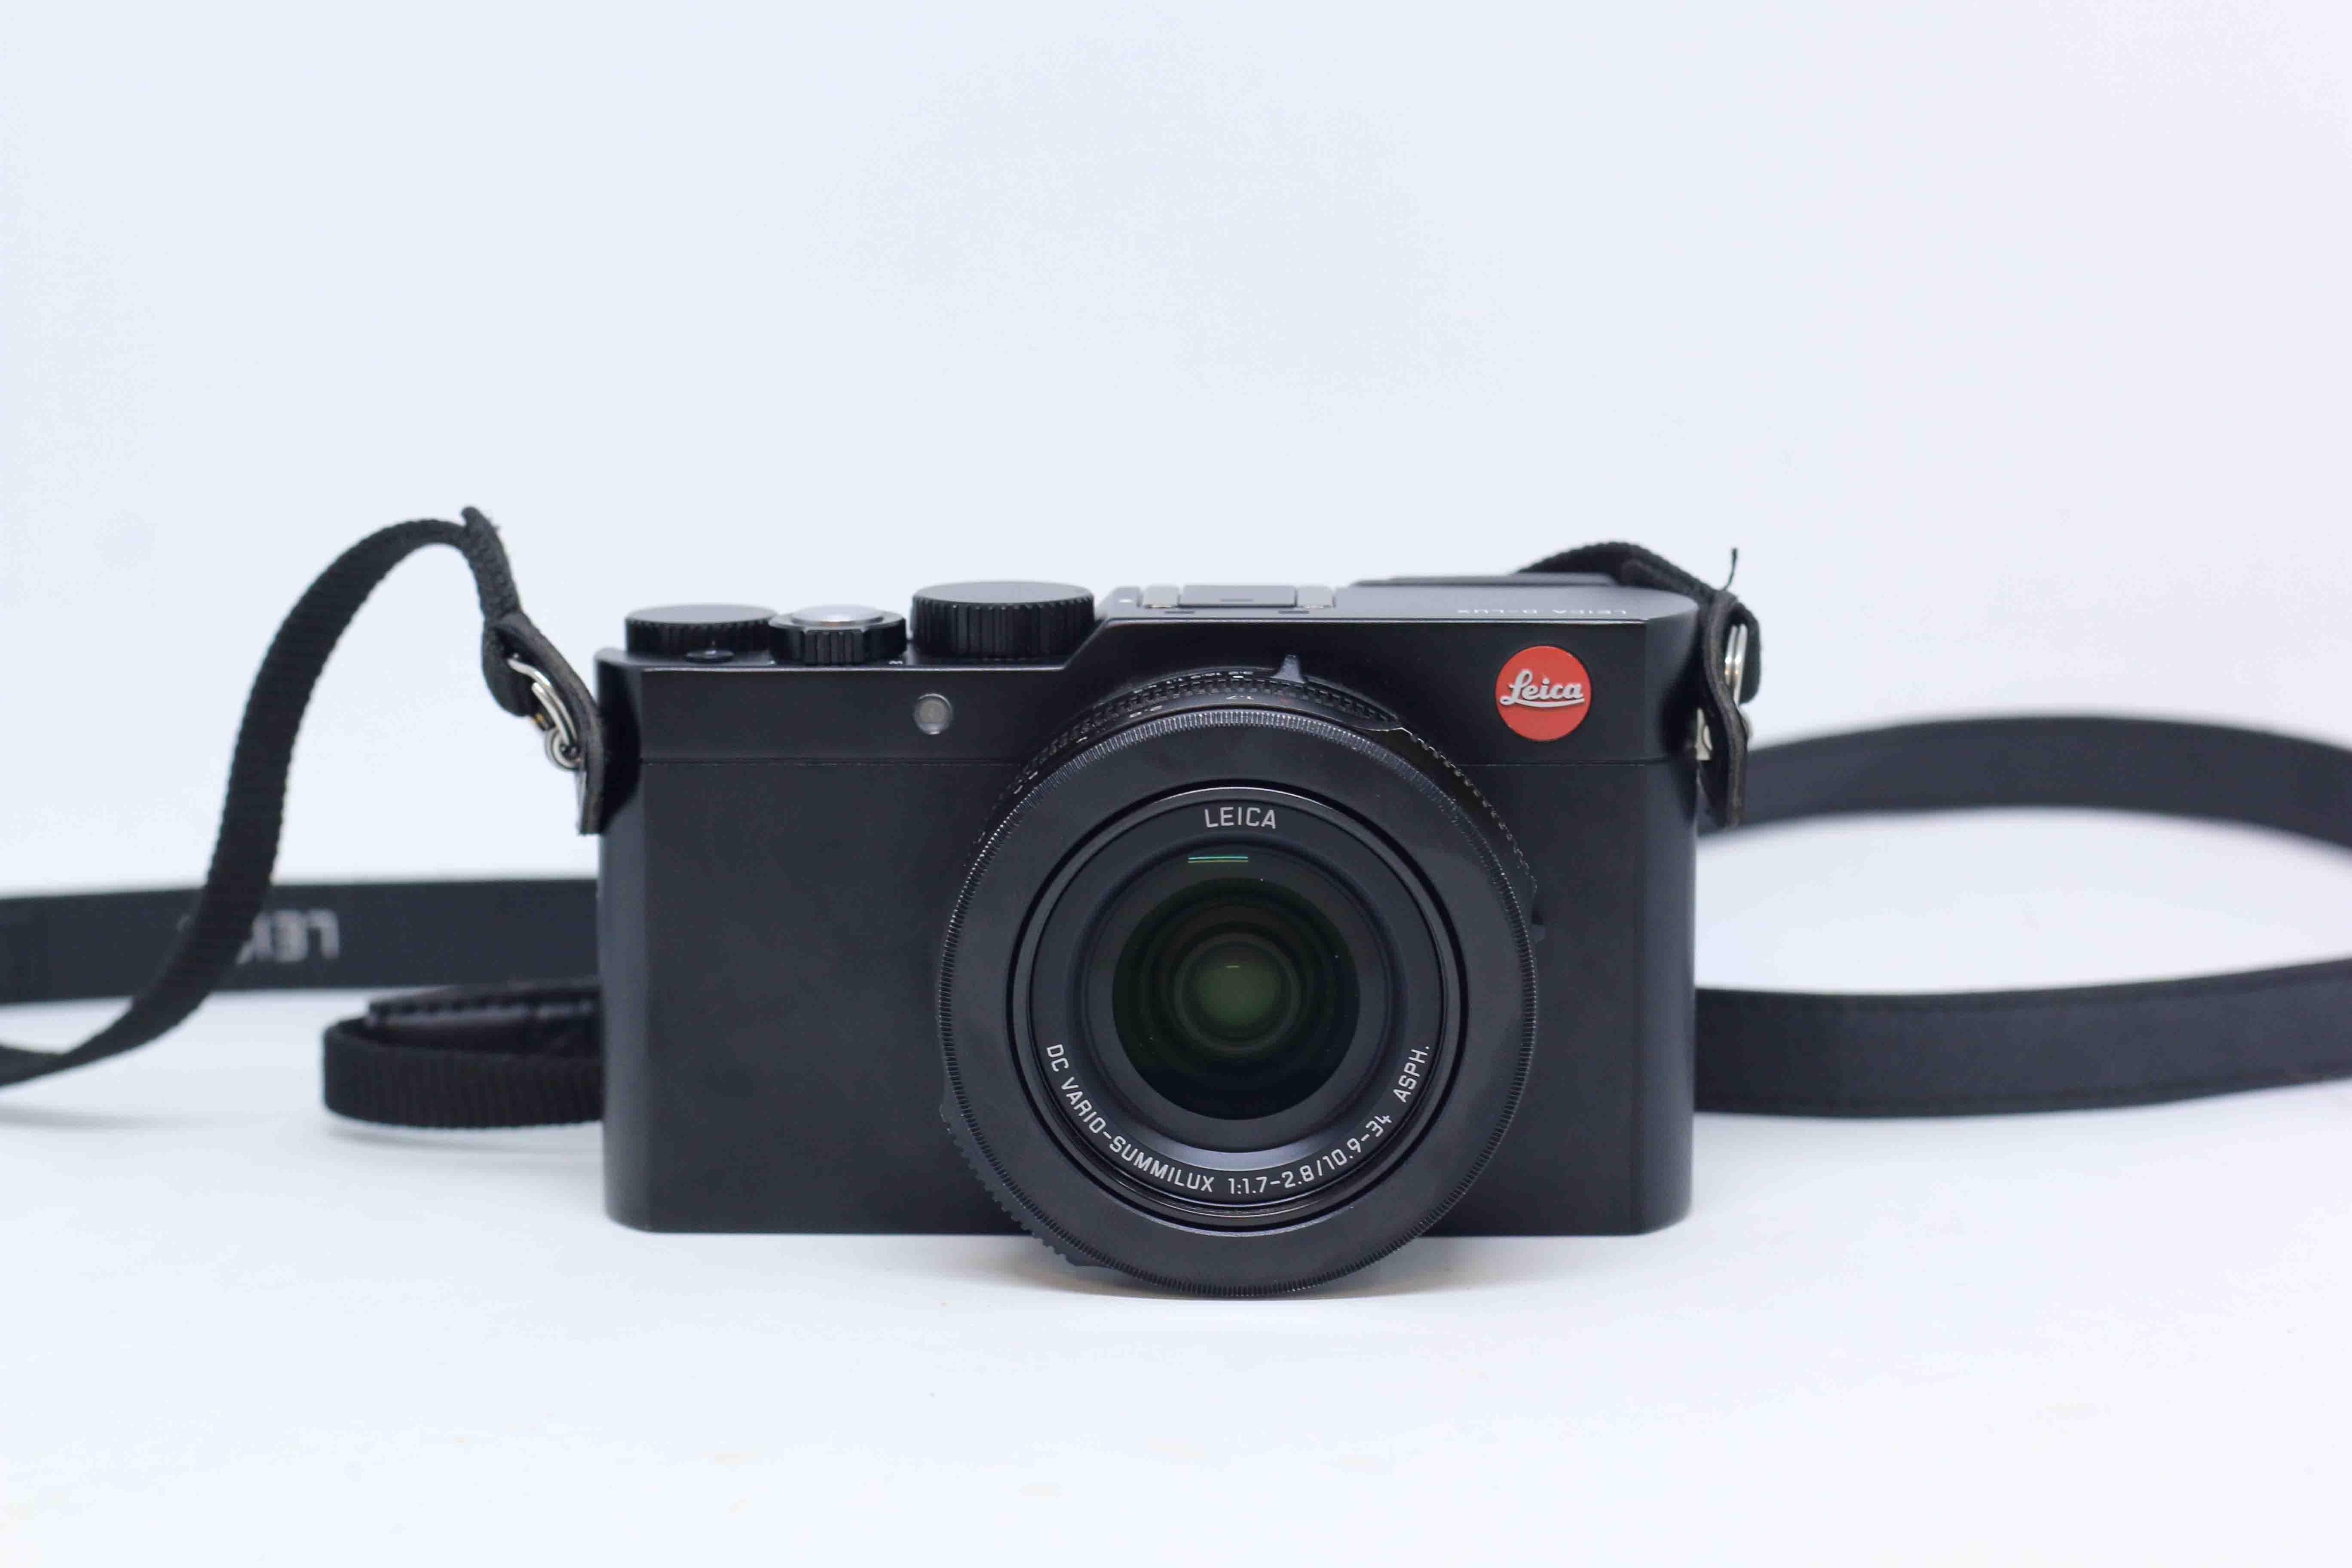 Máy ảnh Leica D-LUX ( Typ 109 )